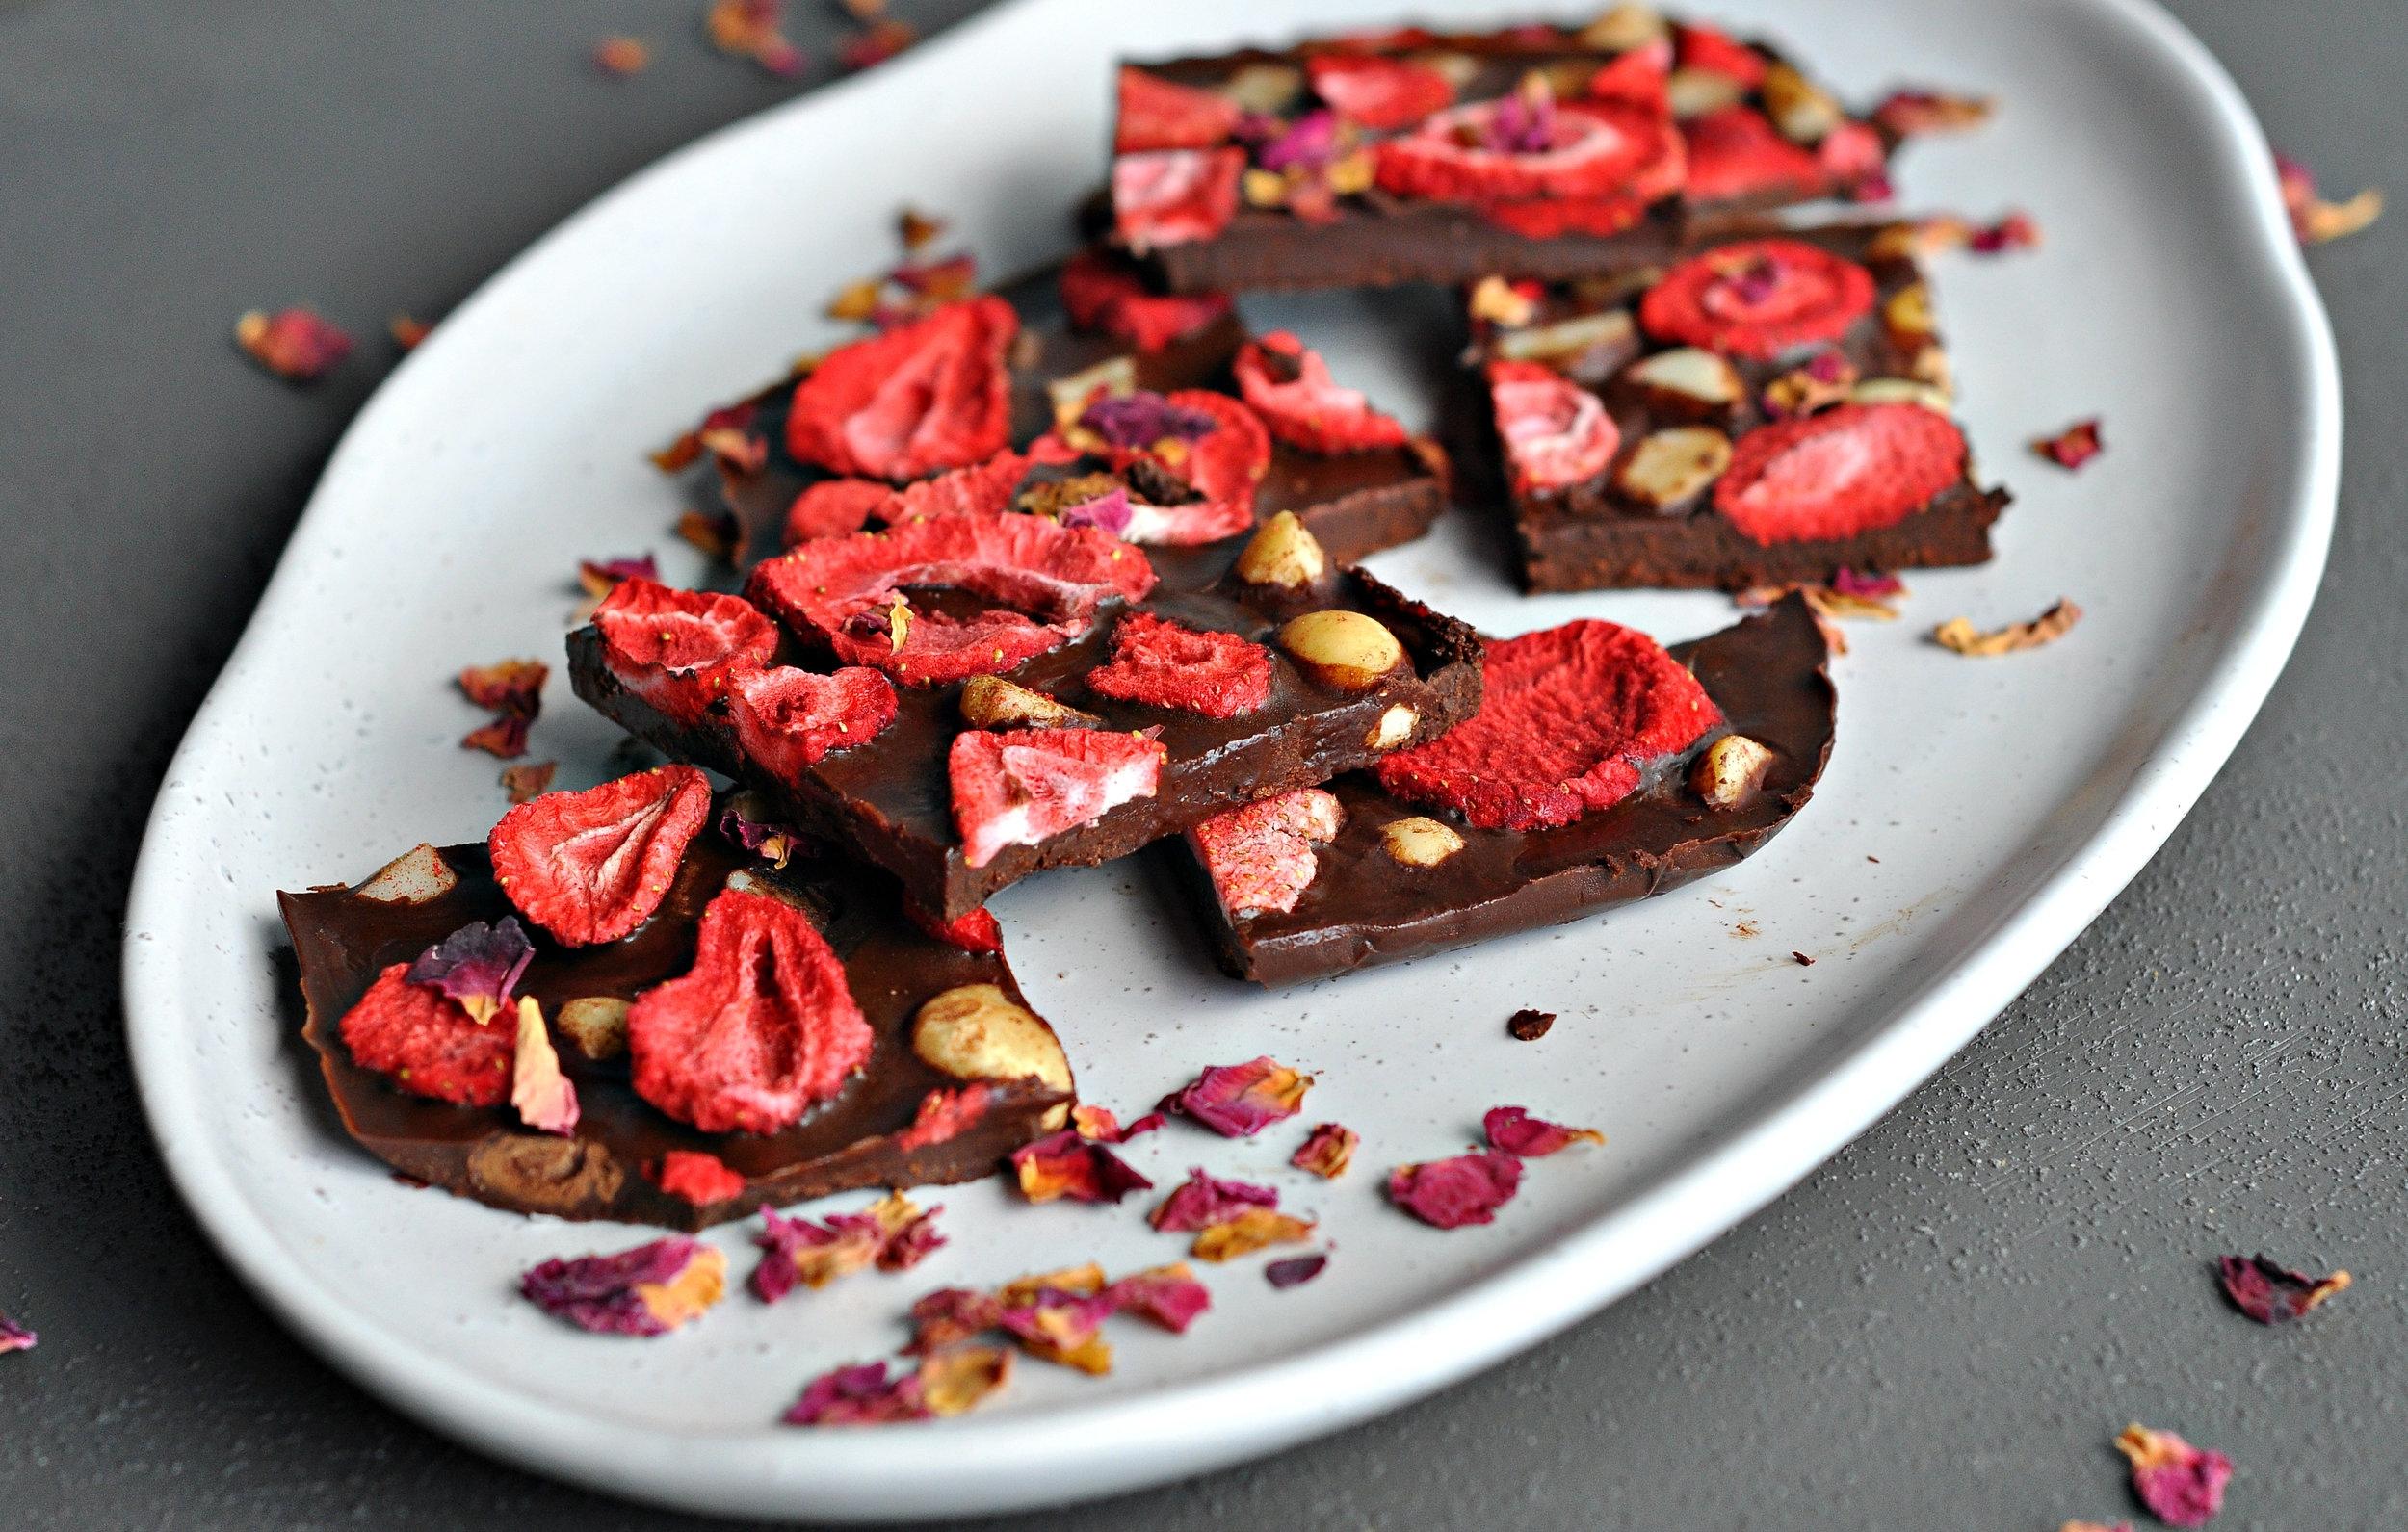 Strawberry and Cinnamon Macadamia Chocolate3.jpg